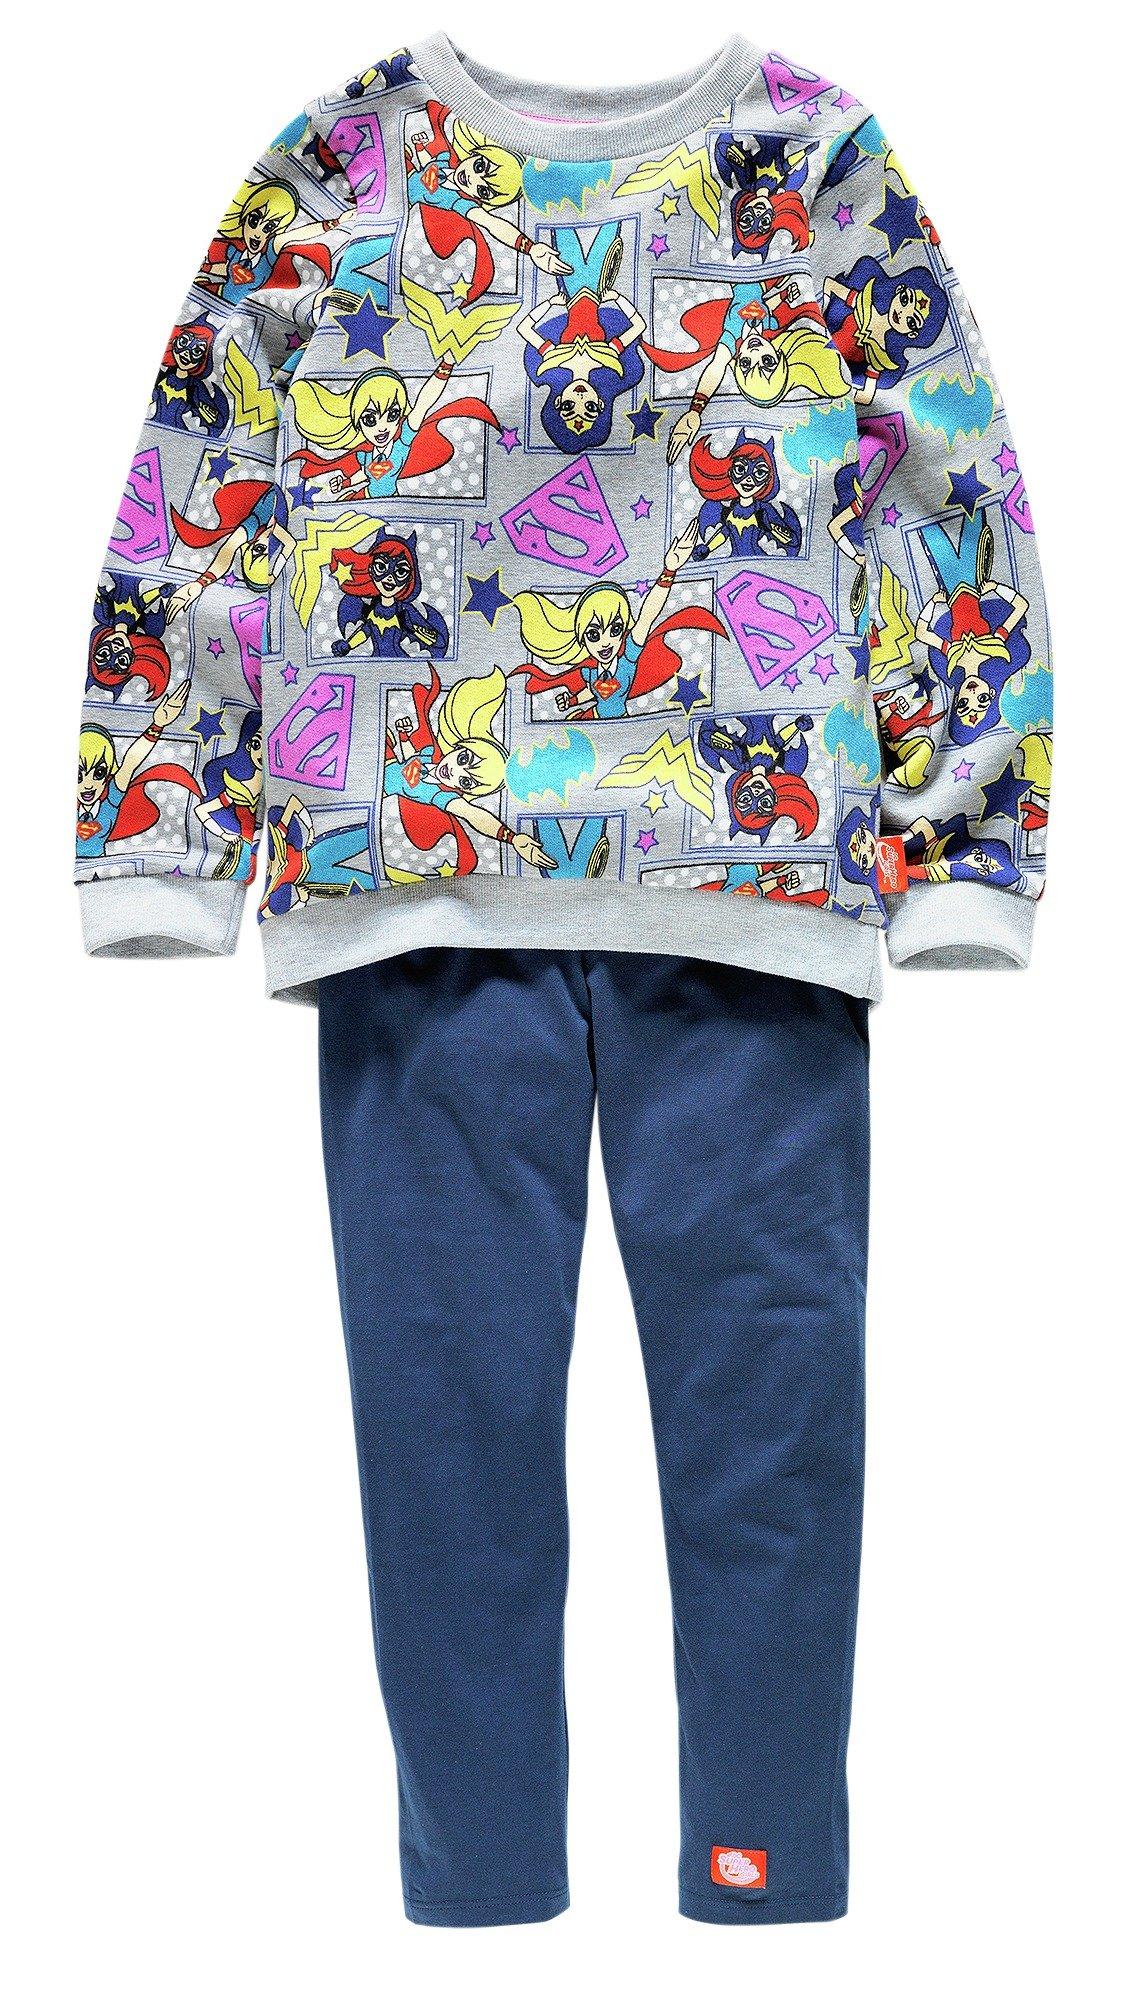 Image of DC Supergirl Sweatshirt & Leggings Set - 7-8 Years